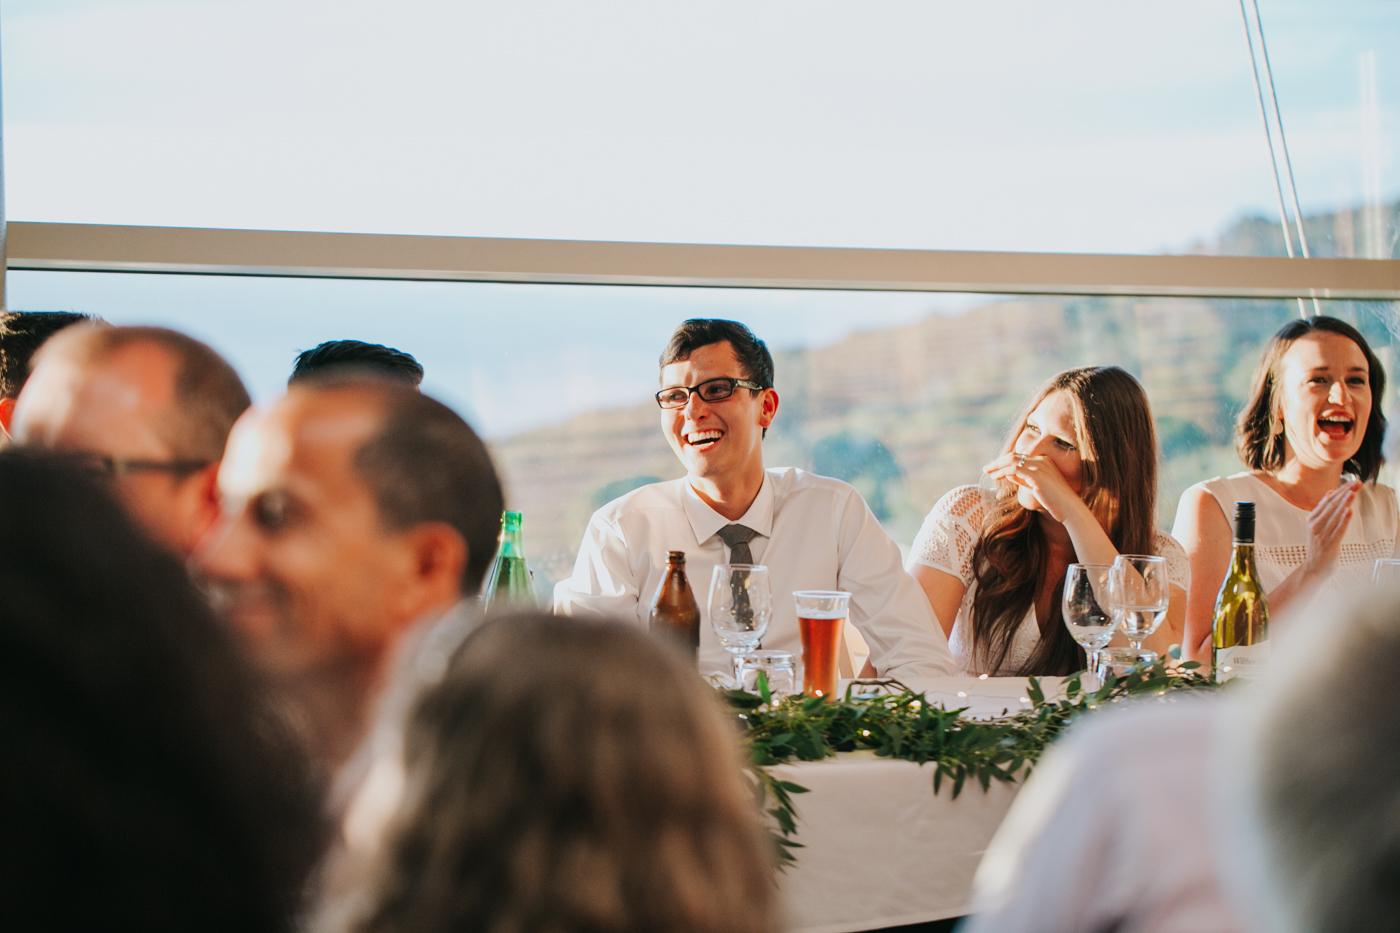 Ariana & Tim - Dunedin, New Zealand Wedding - Destination Wedding - Samantha Heather Photography-238.jpg